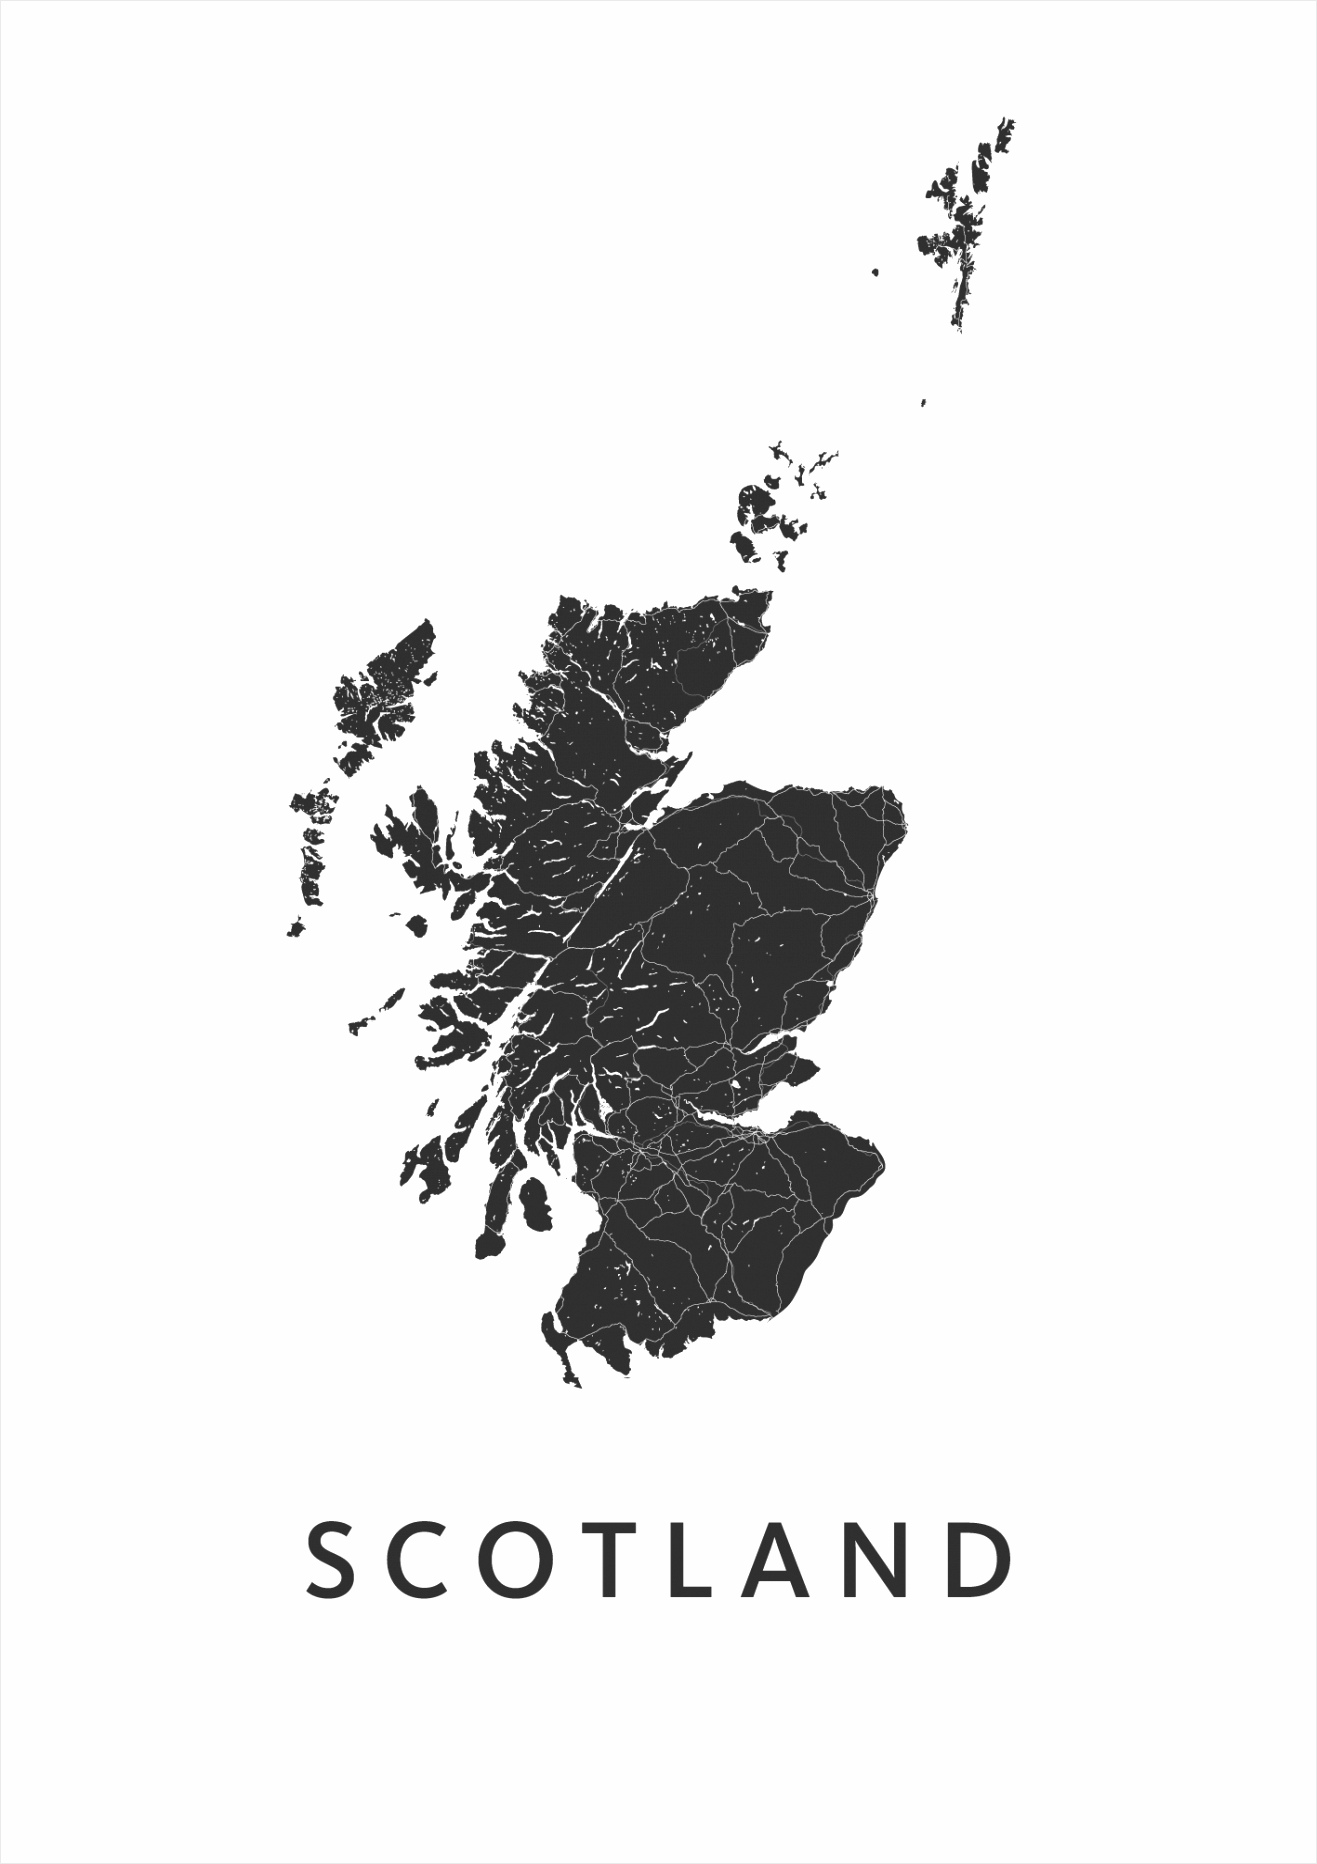 Scotland White B2 autwu